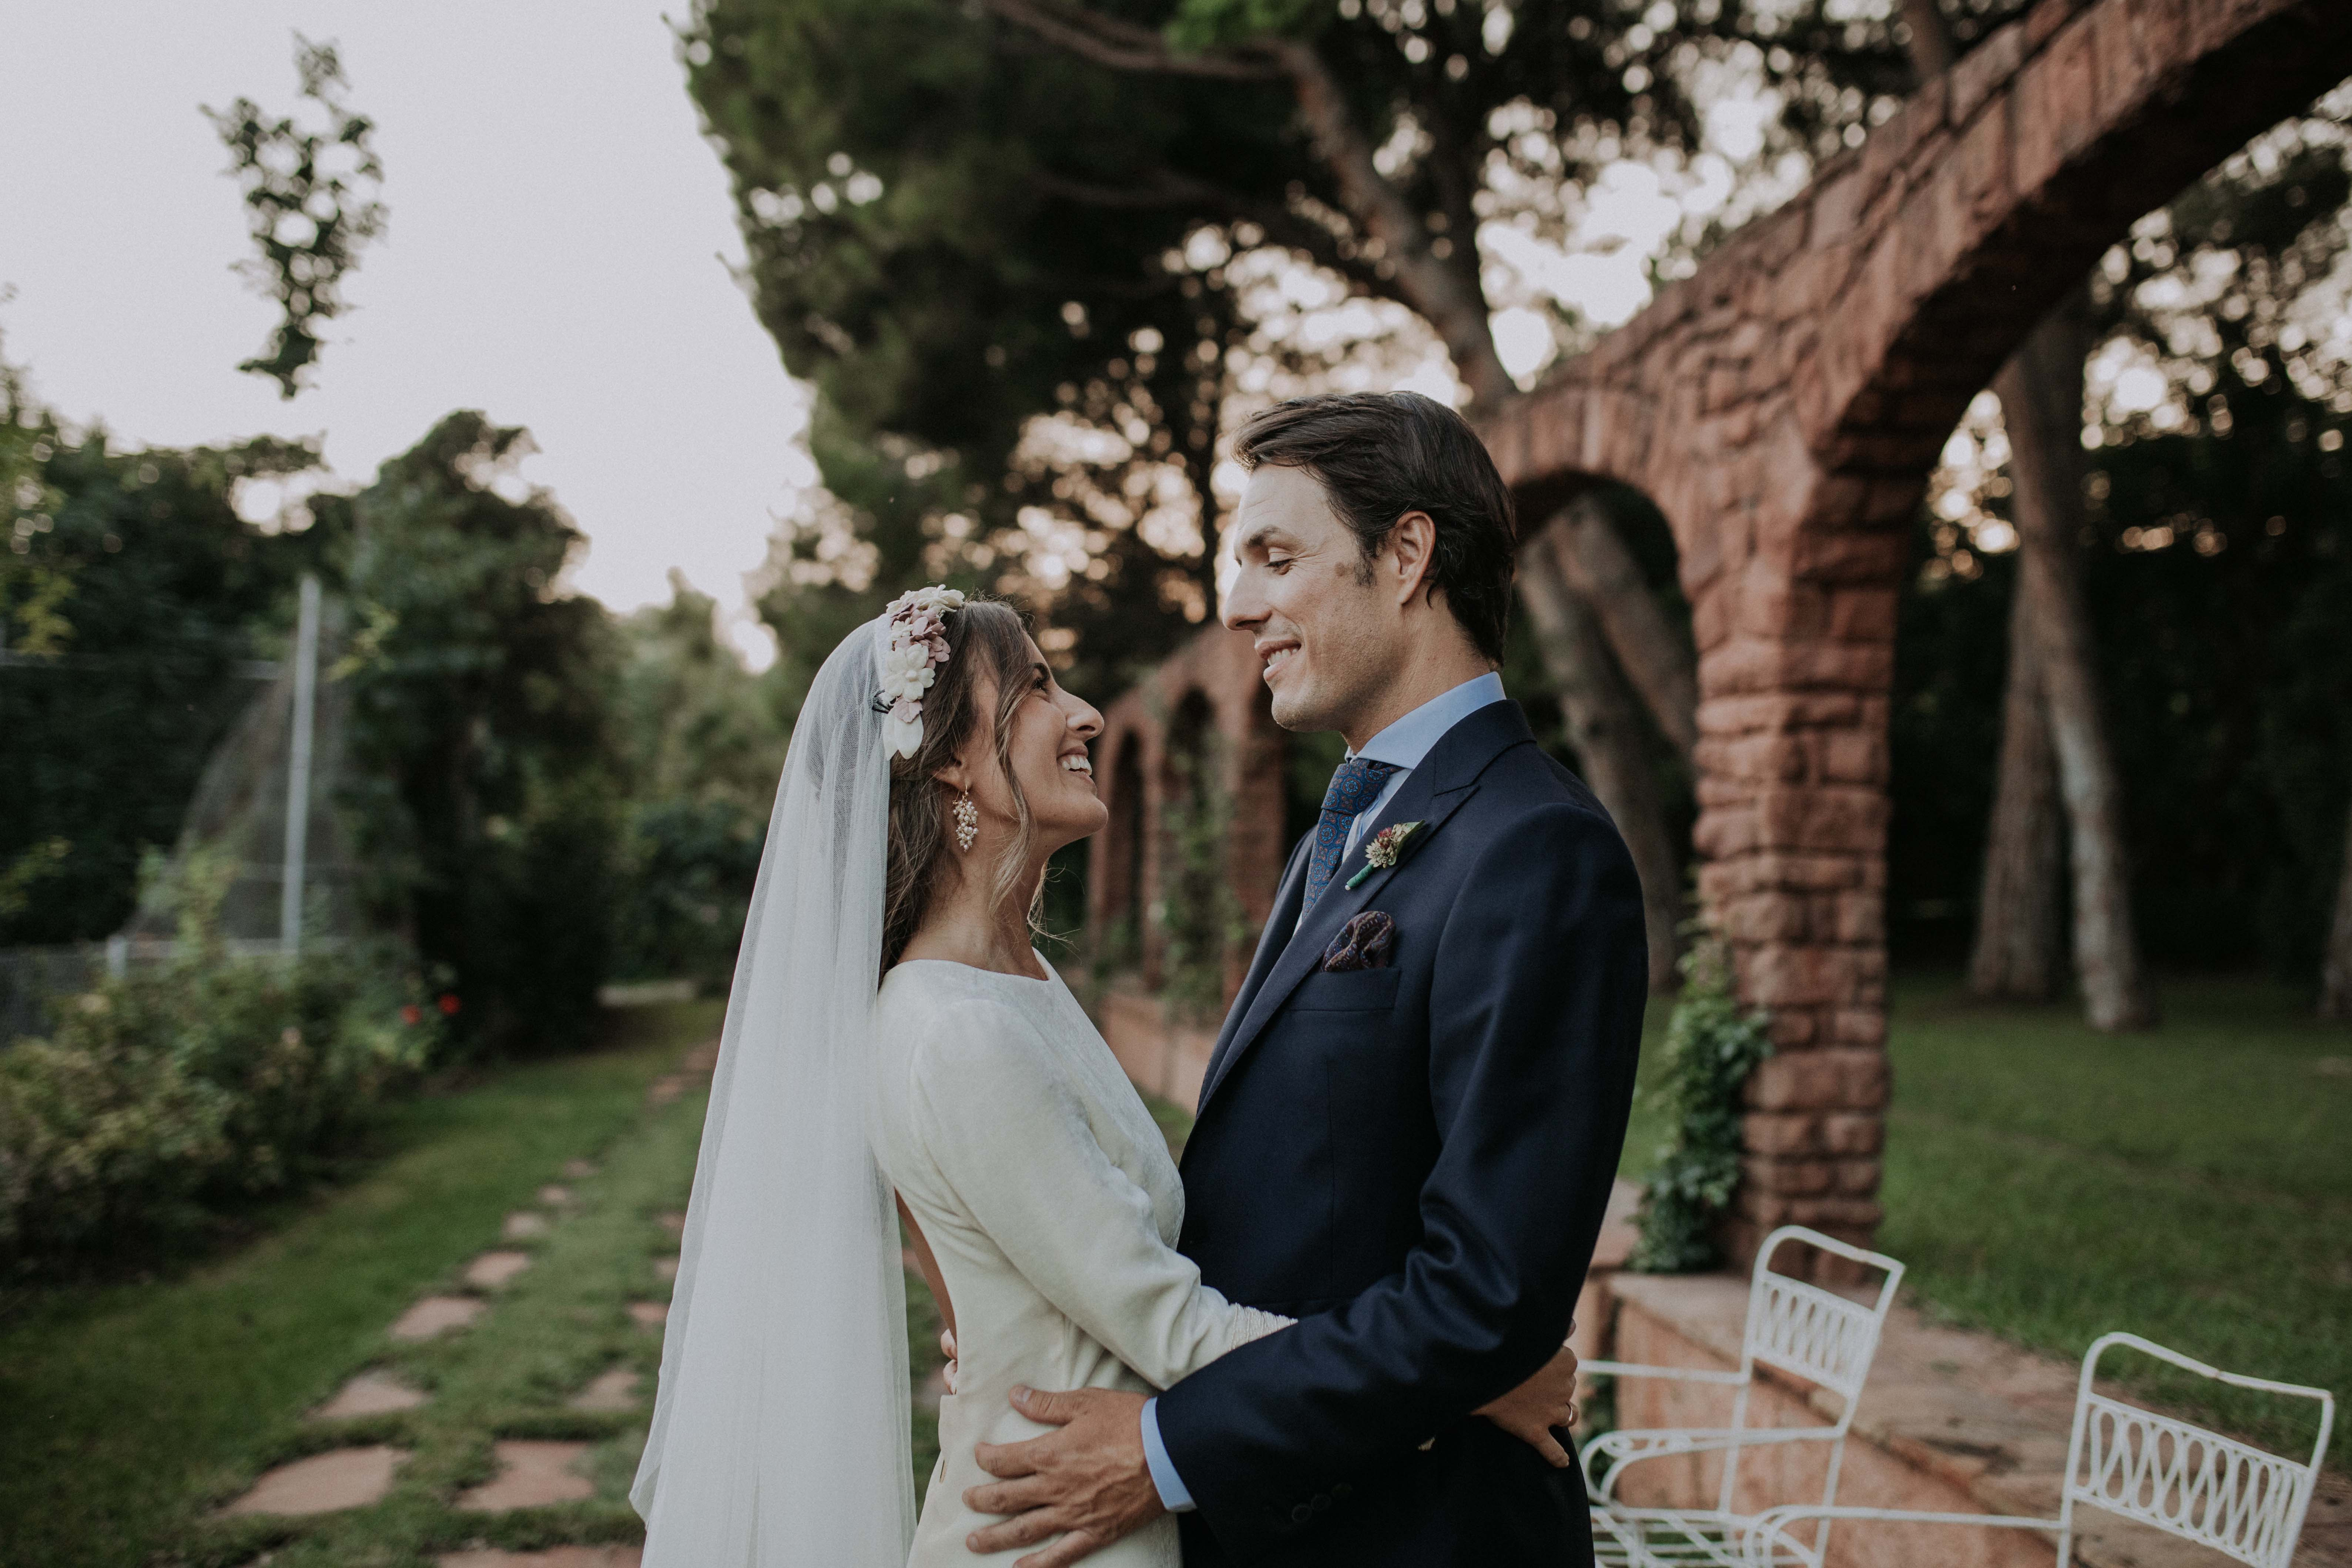 La boda de Ana y Pepe en Barcelona